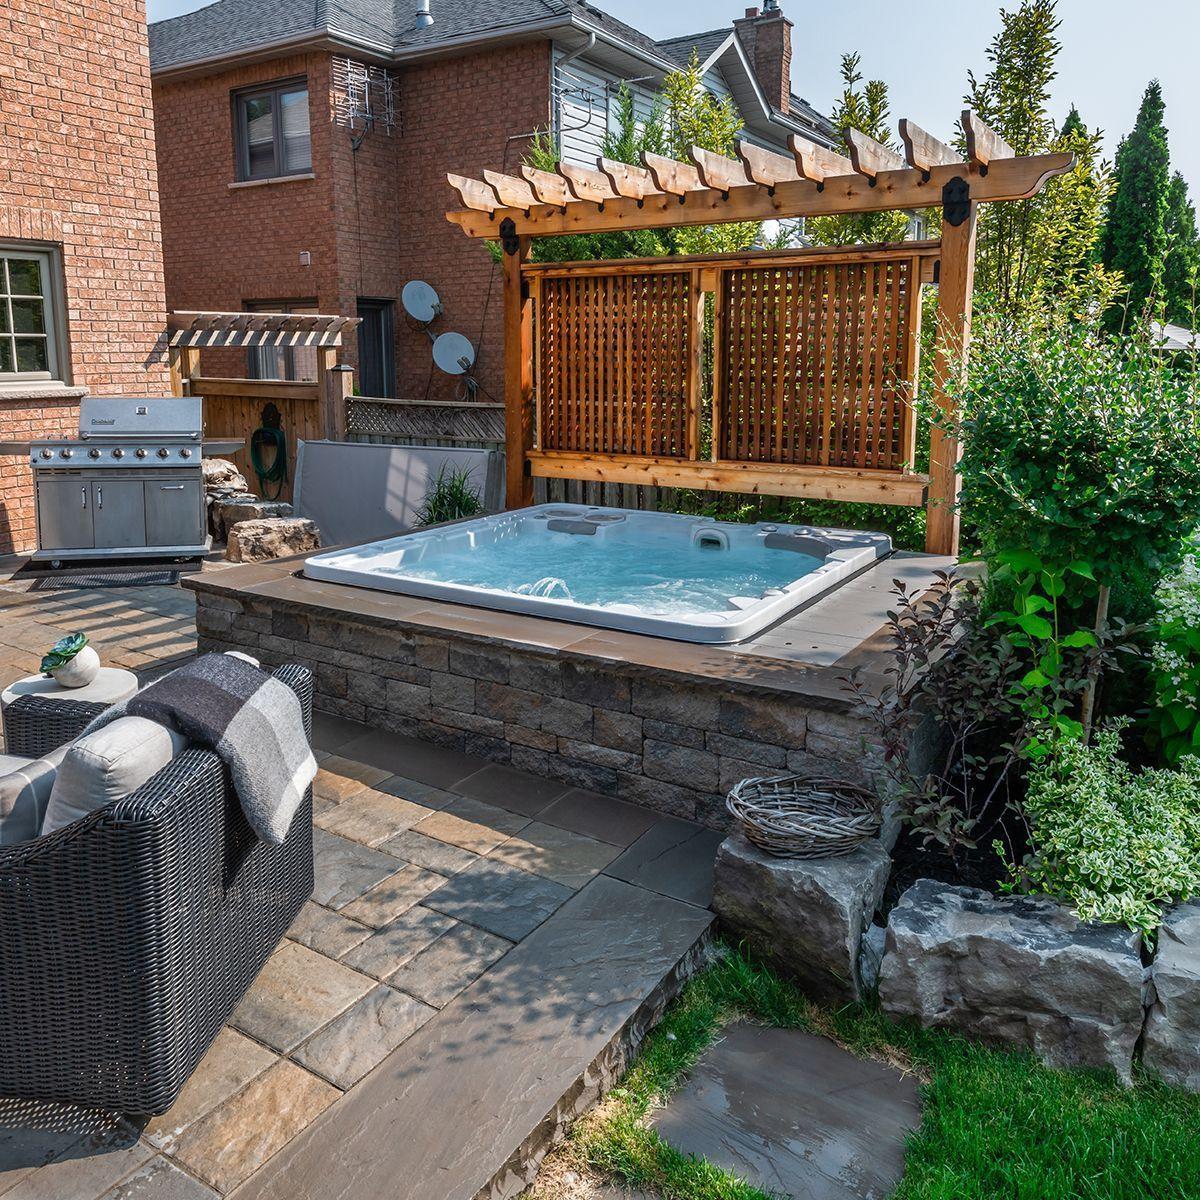 20 Inspiring Hot Tub Patio Design Ideas For Your Outdoor Decor ...